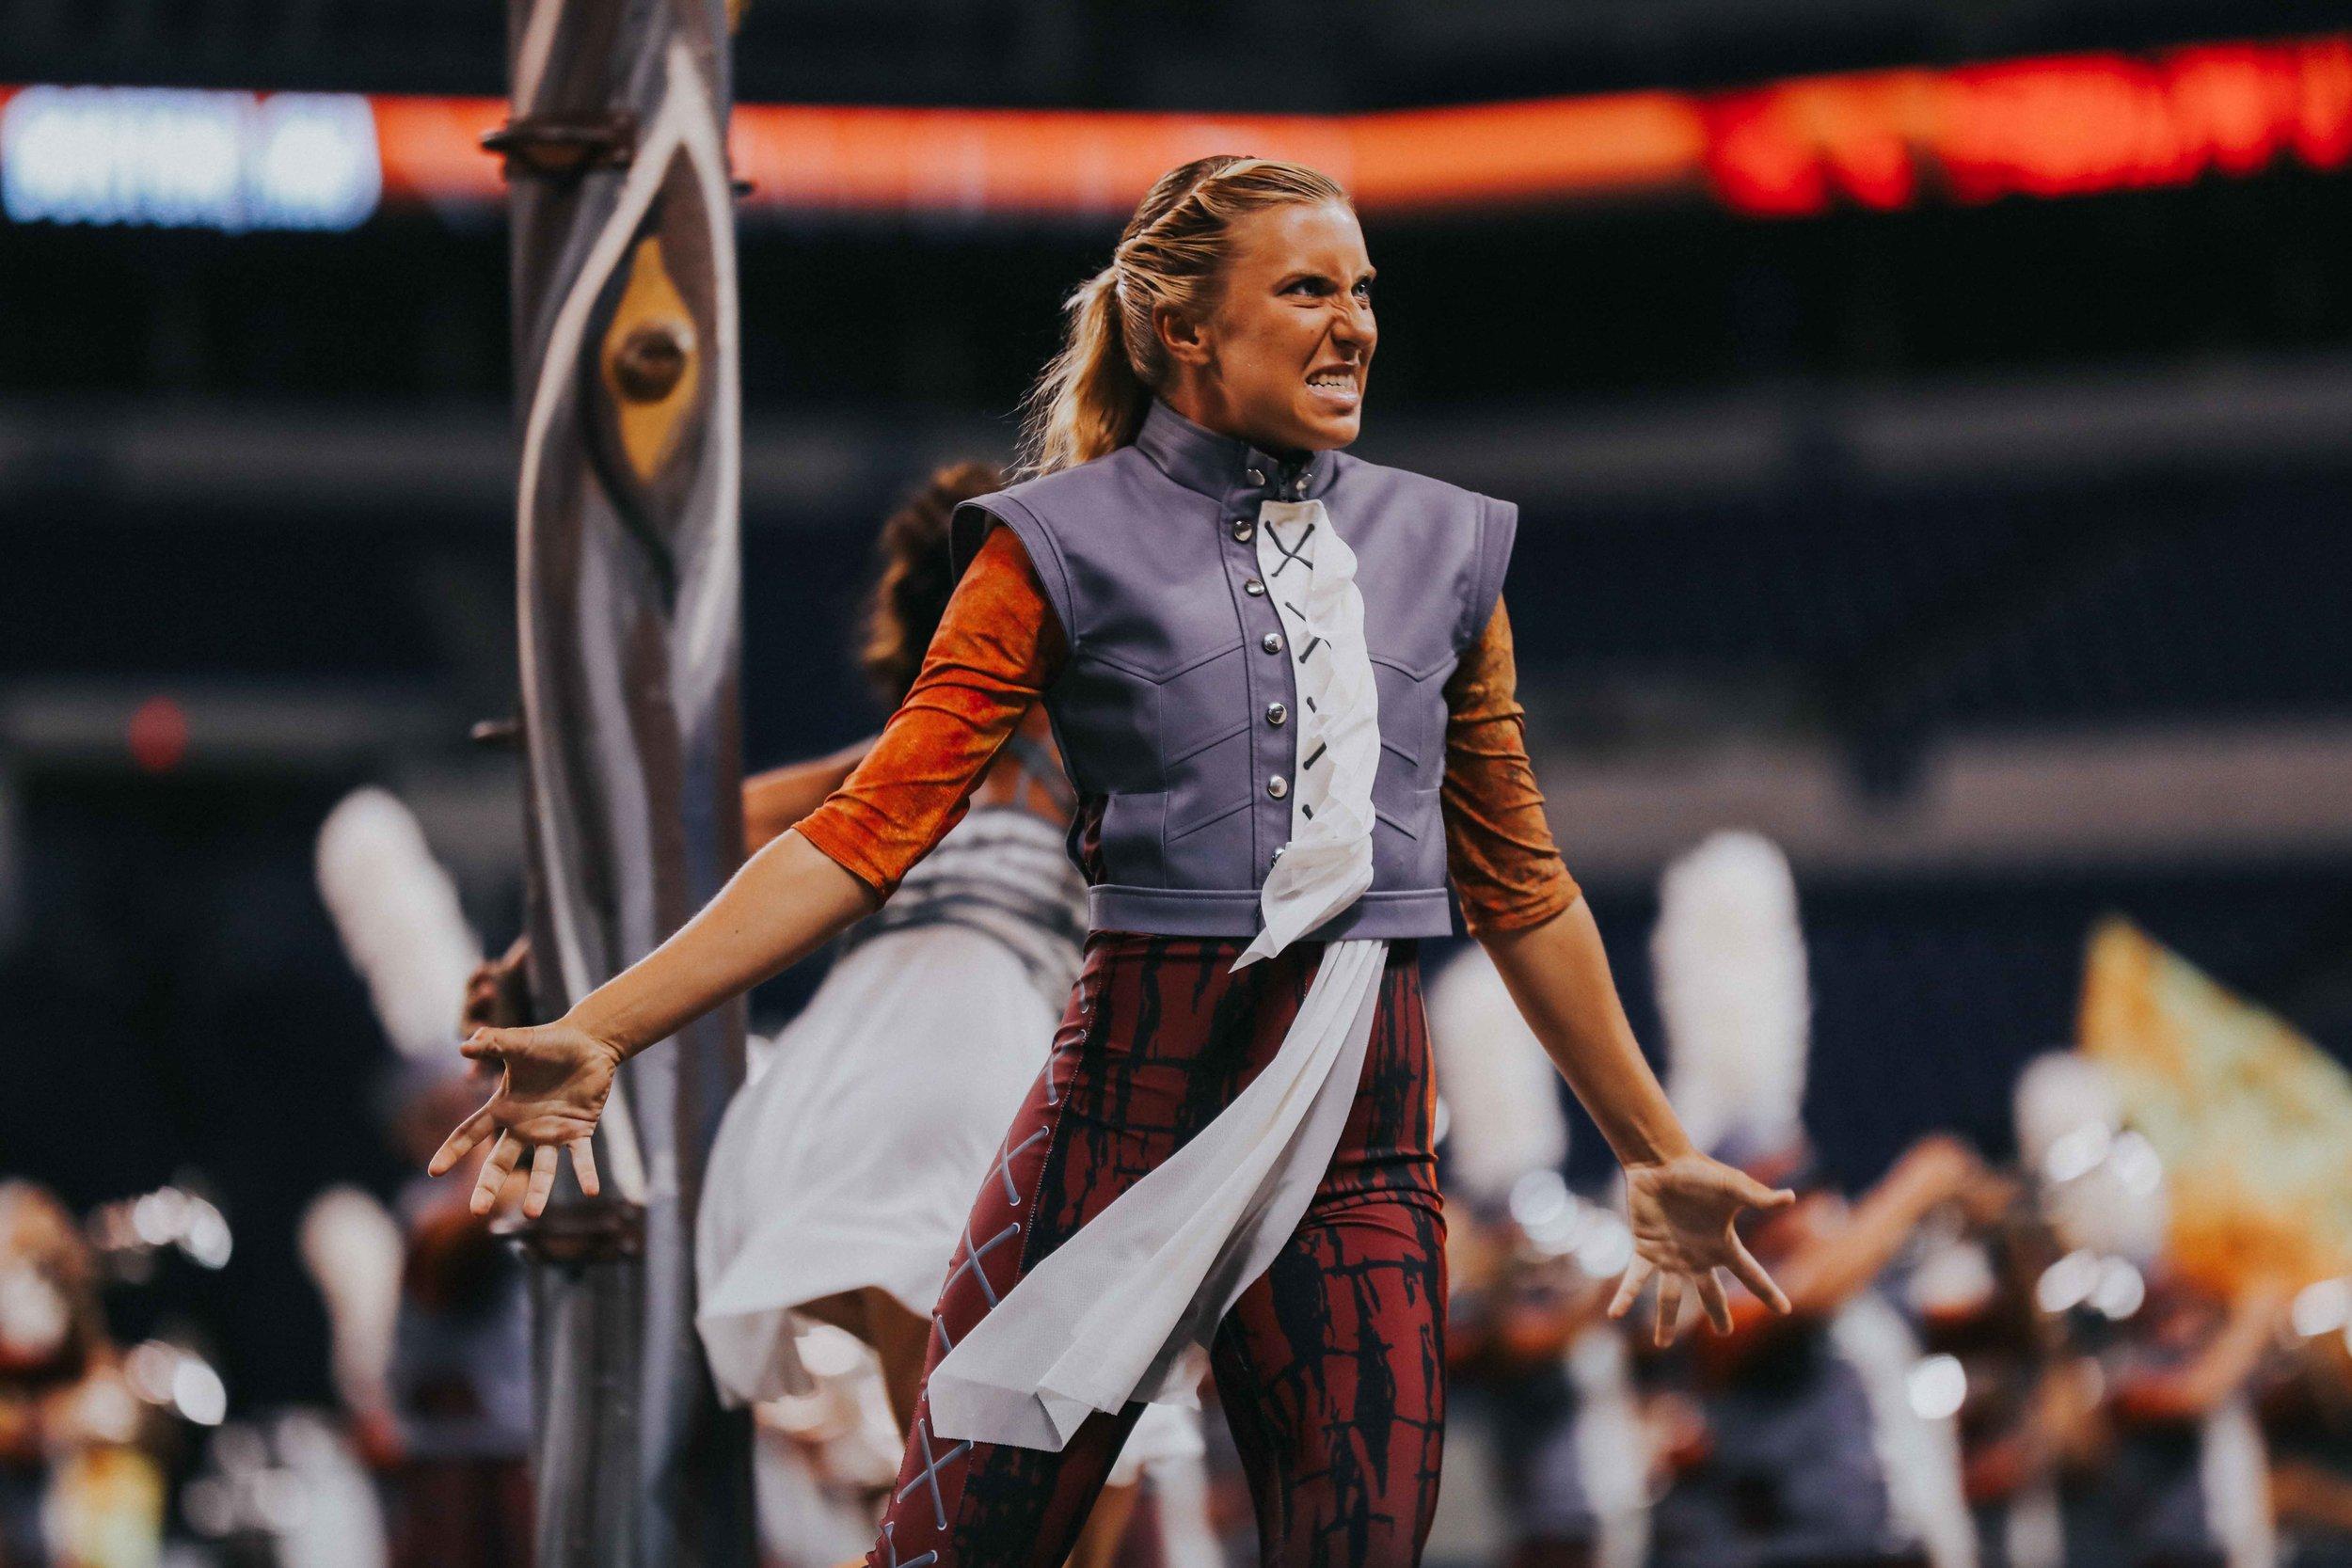 Kaitlin Oresky, Boston Crusaders Drum Major